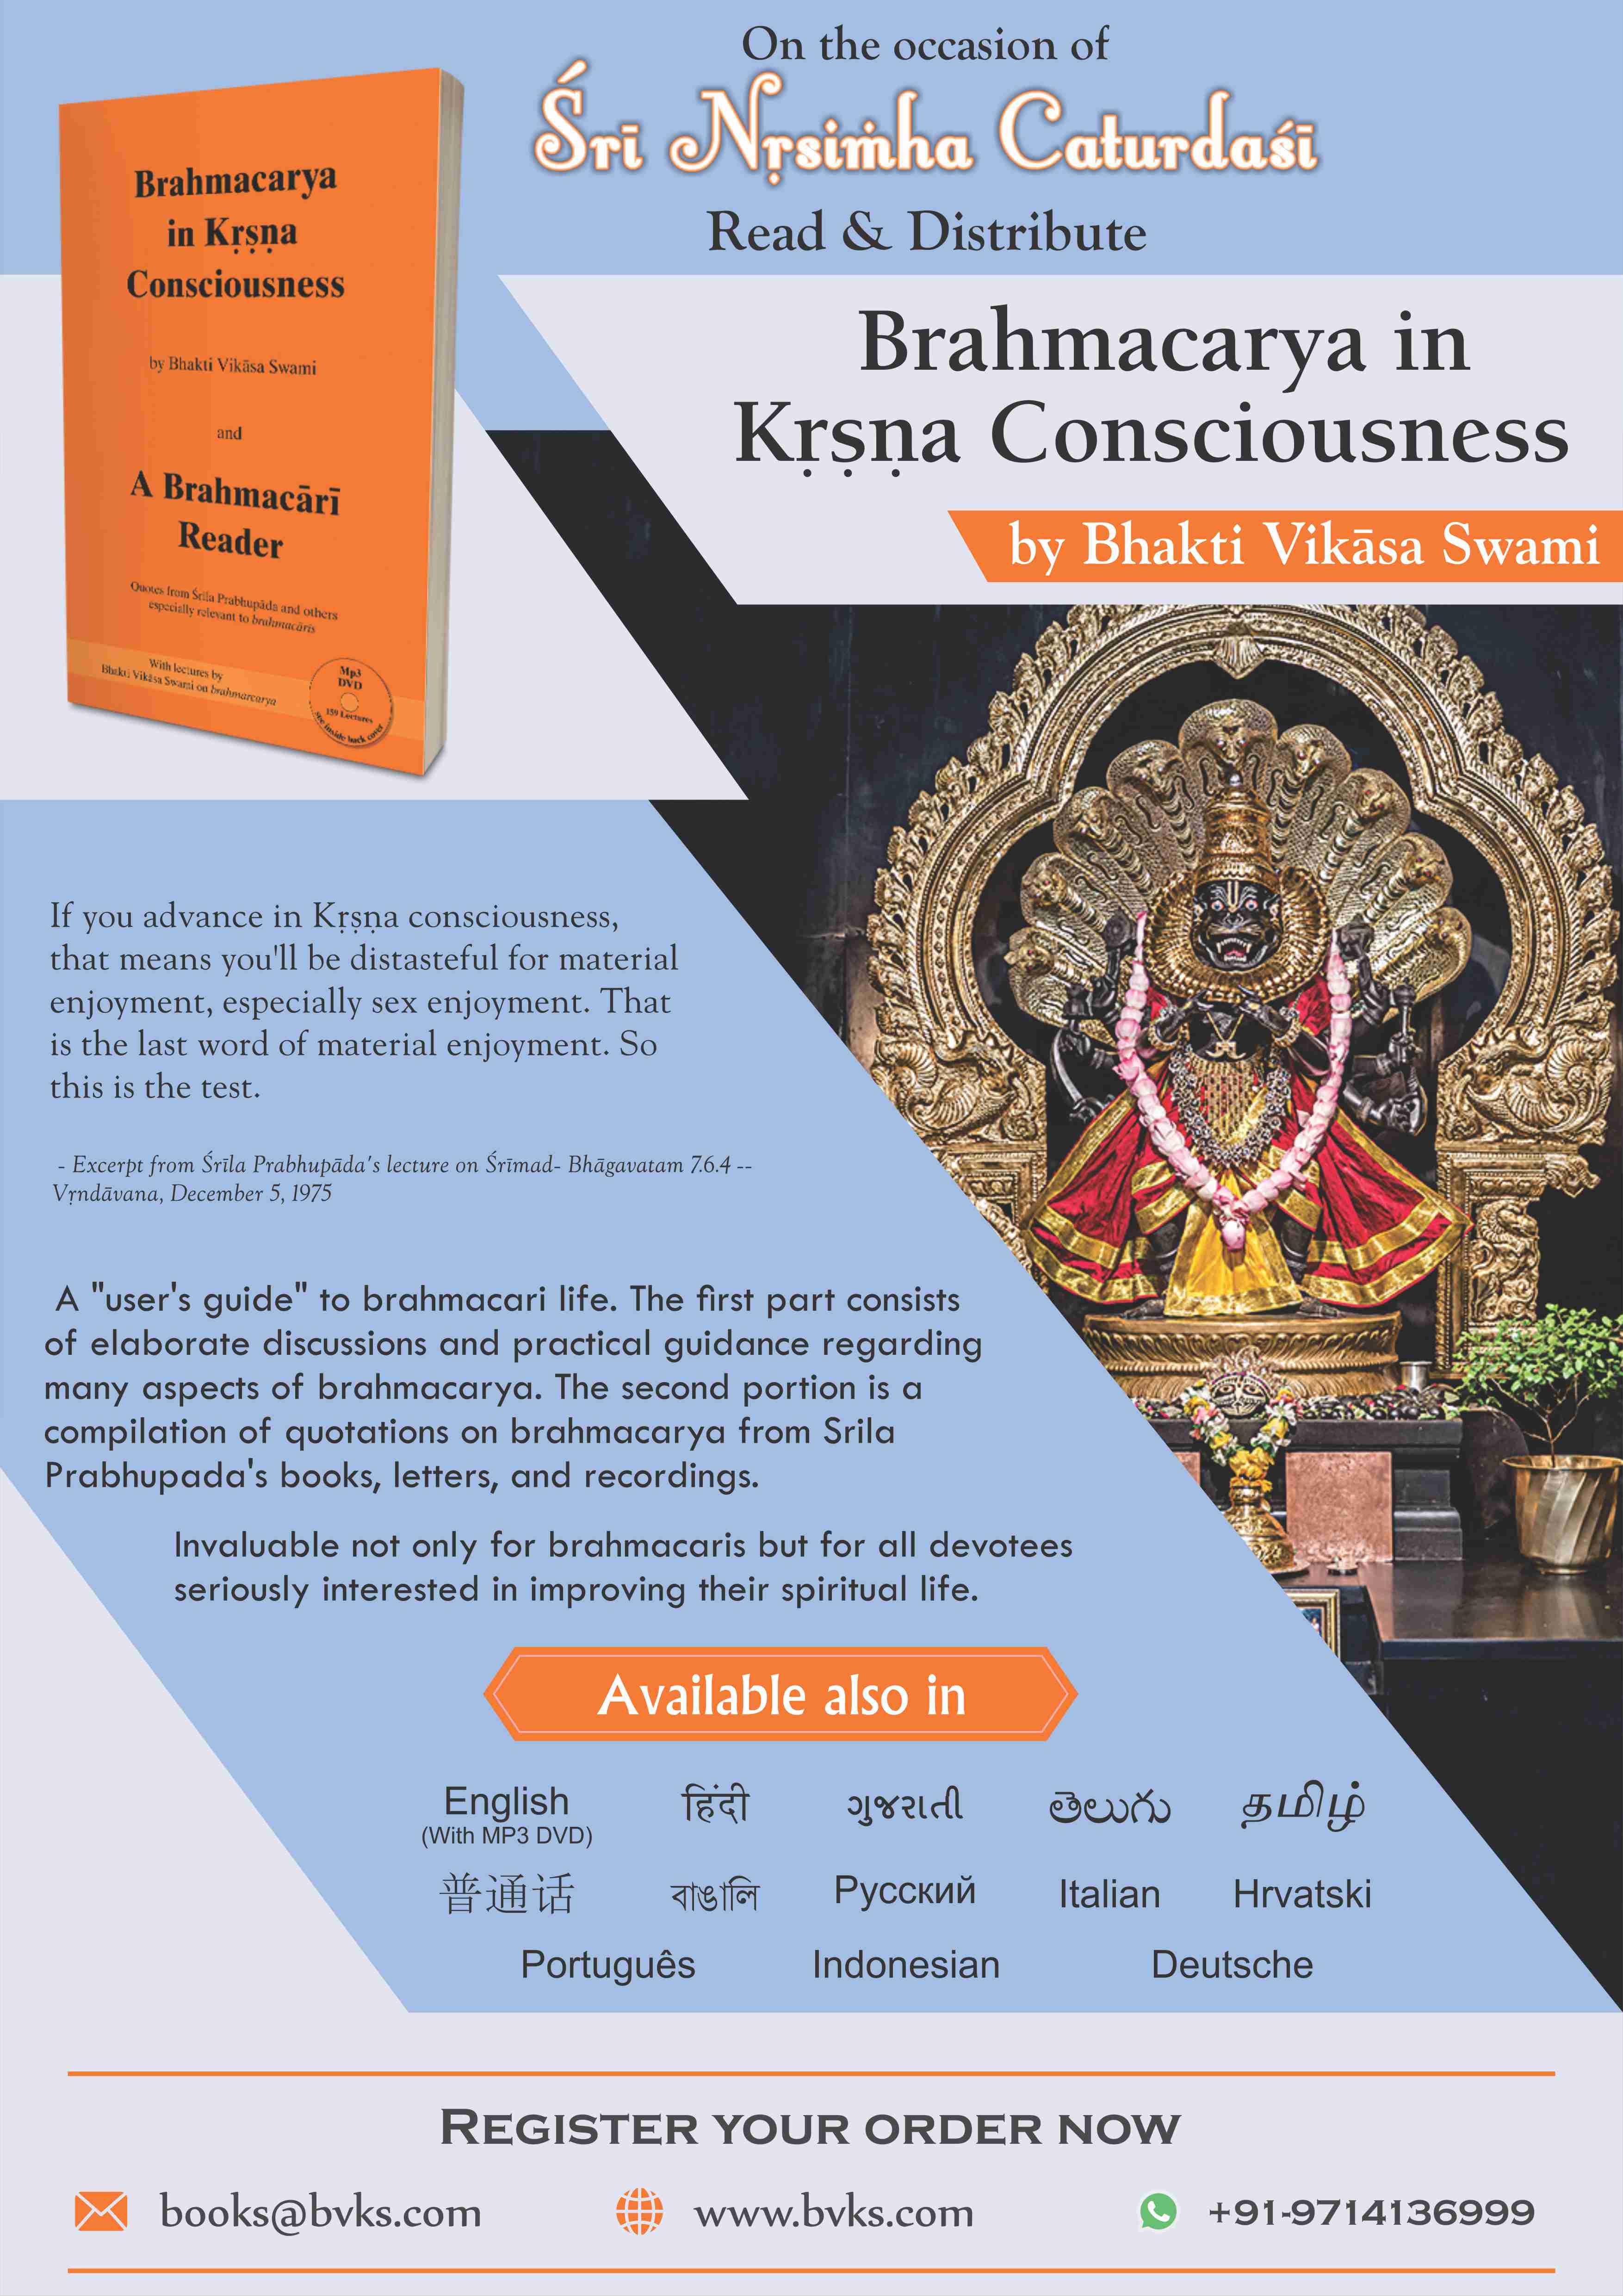 Brahmacharya in Krishna Consciousness